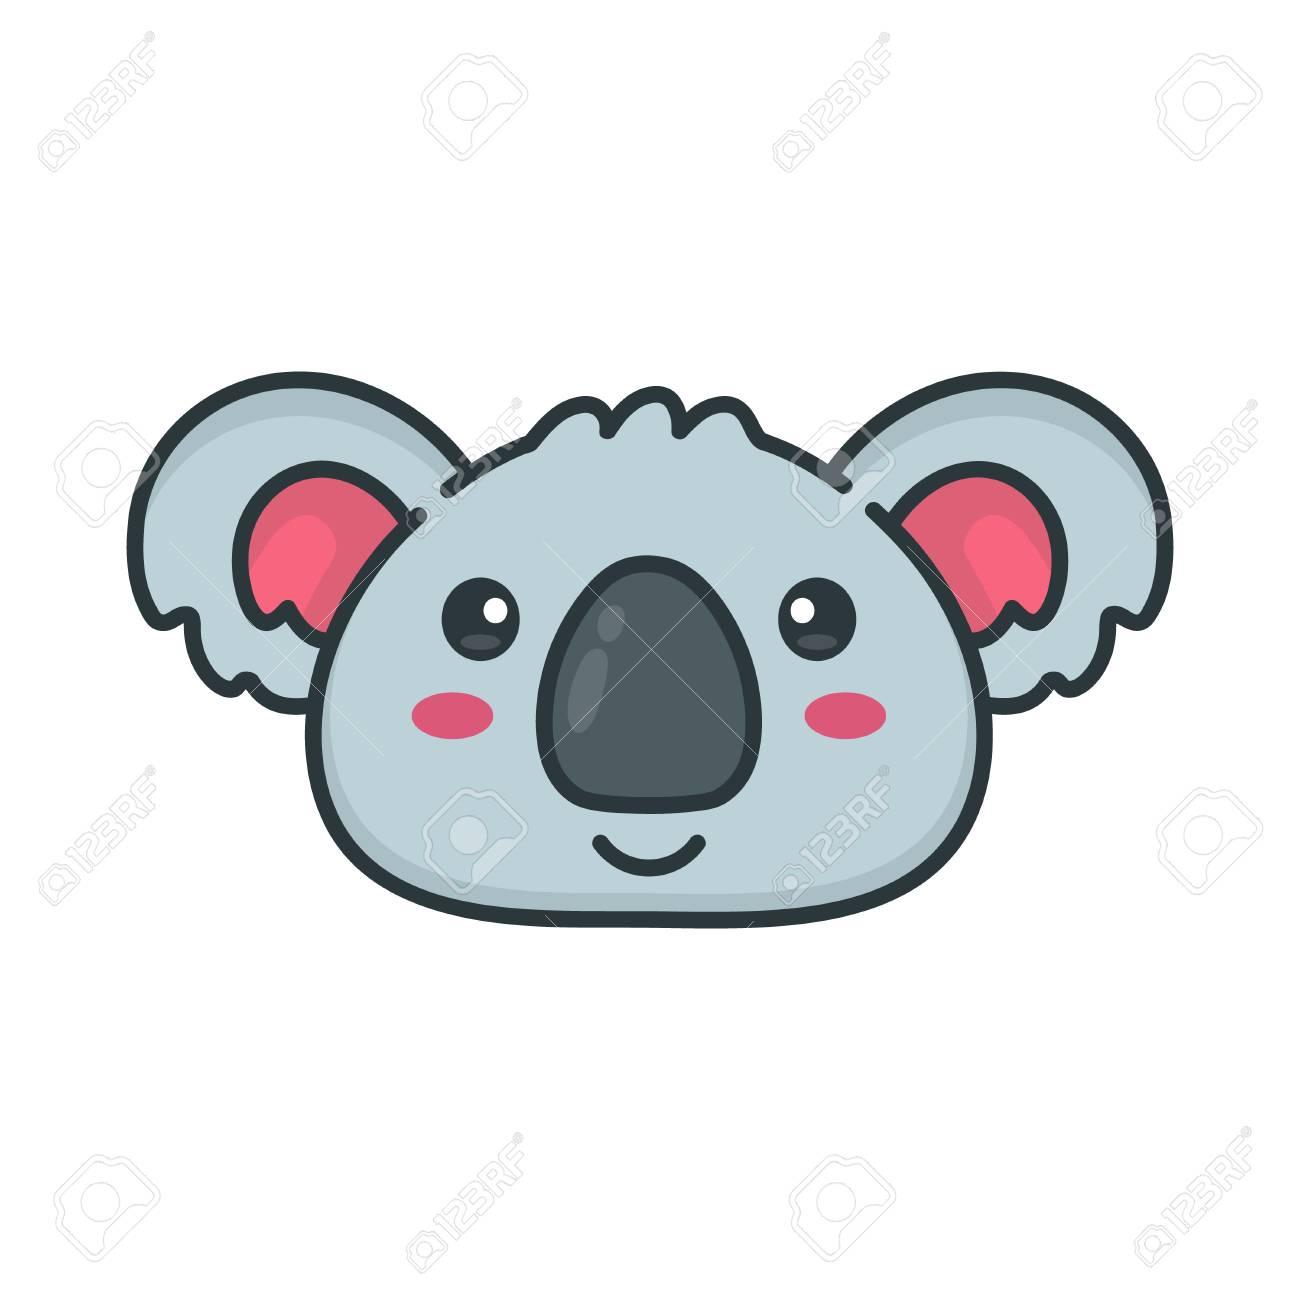 Cute Smiling Happy Koala Bear Face Vector Modern Line Outline